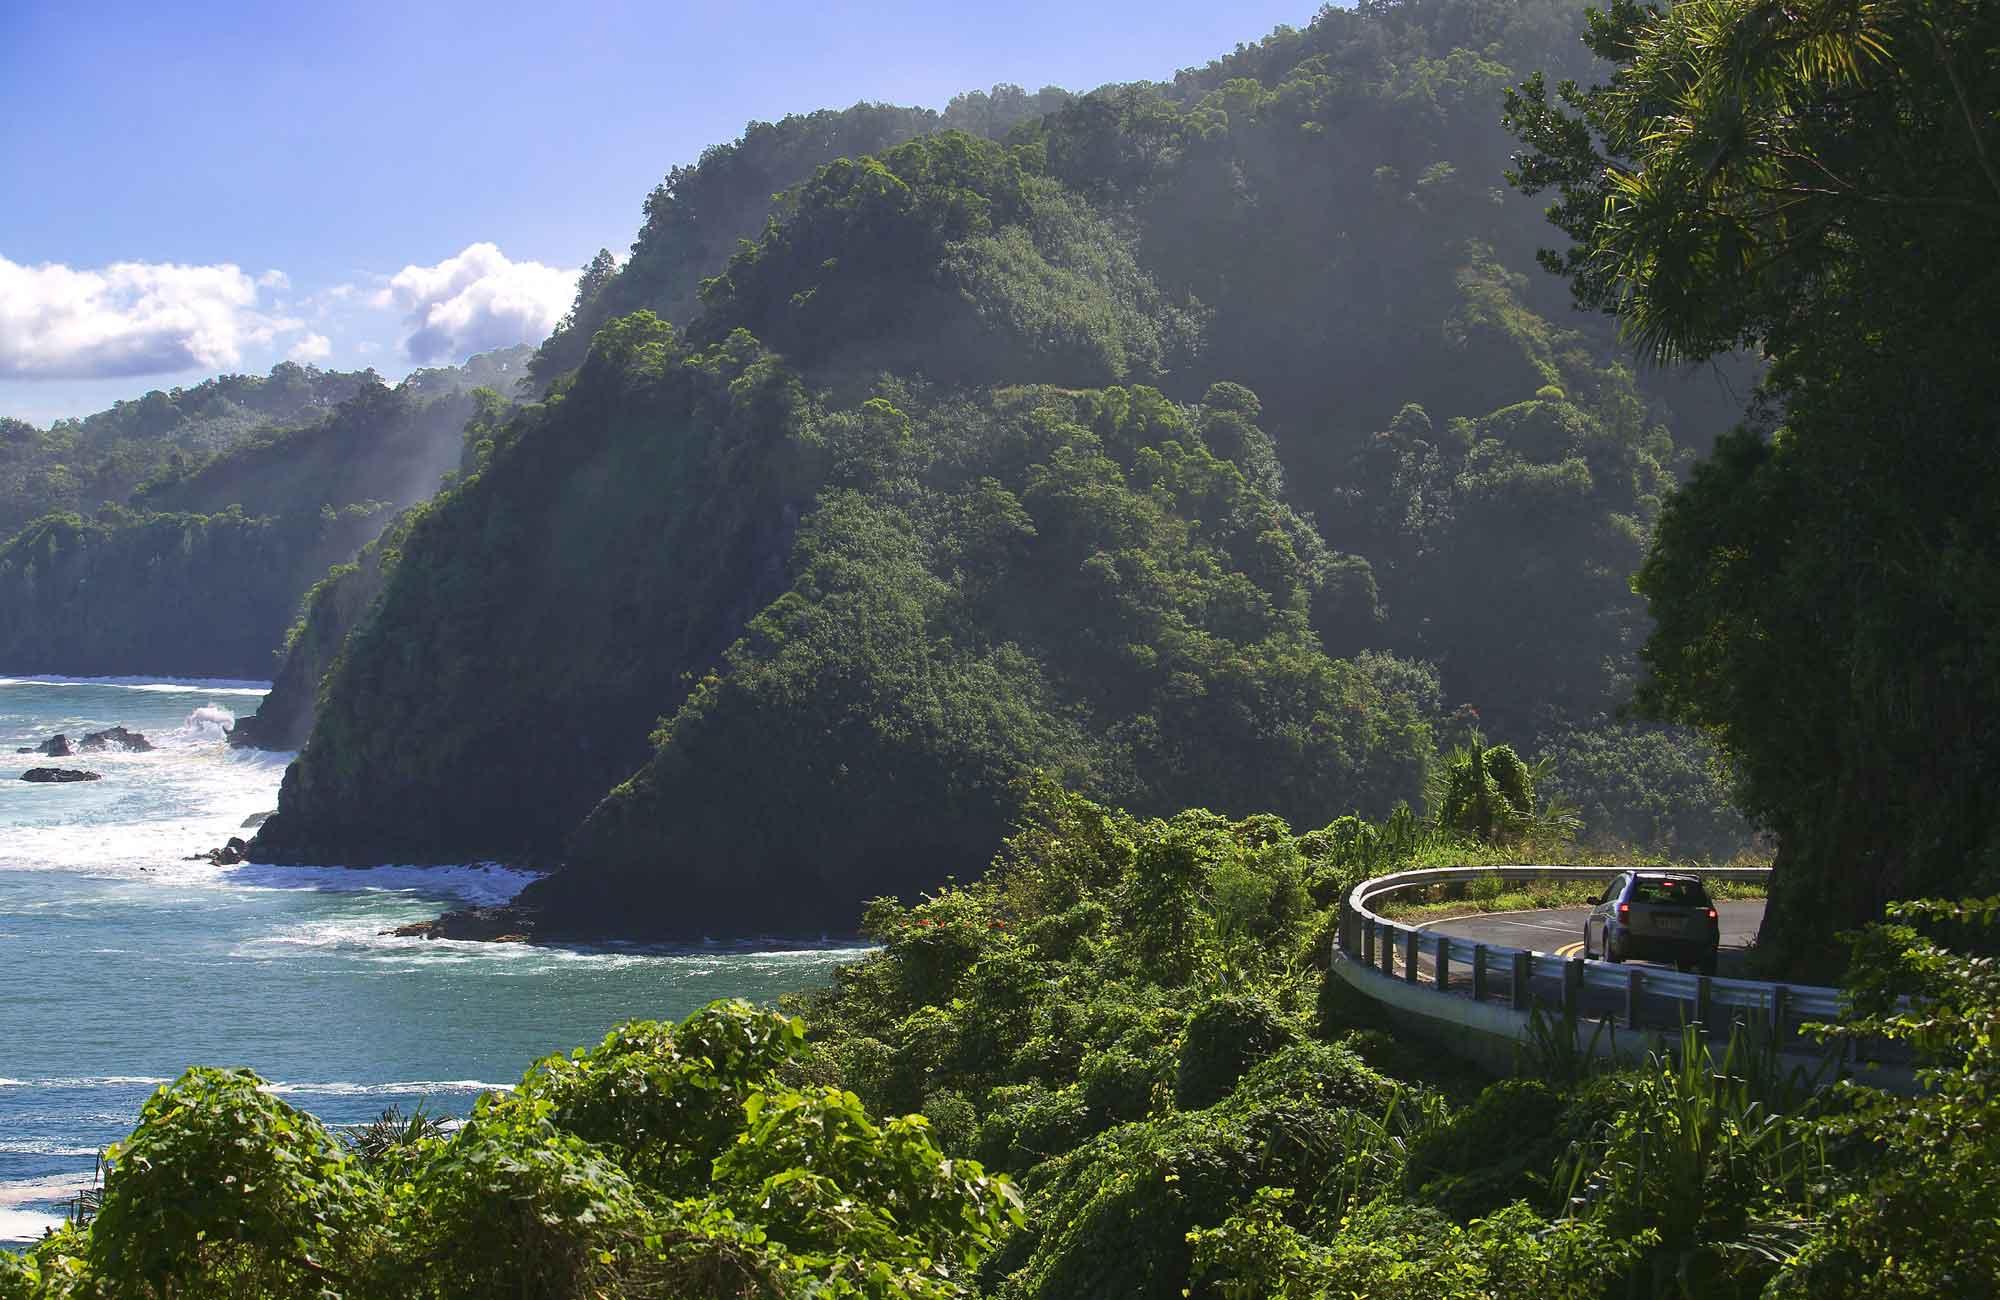 Voyage Etats-Unis - Hana-Highway - Amplitudes